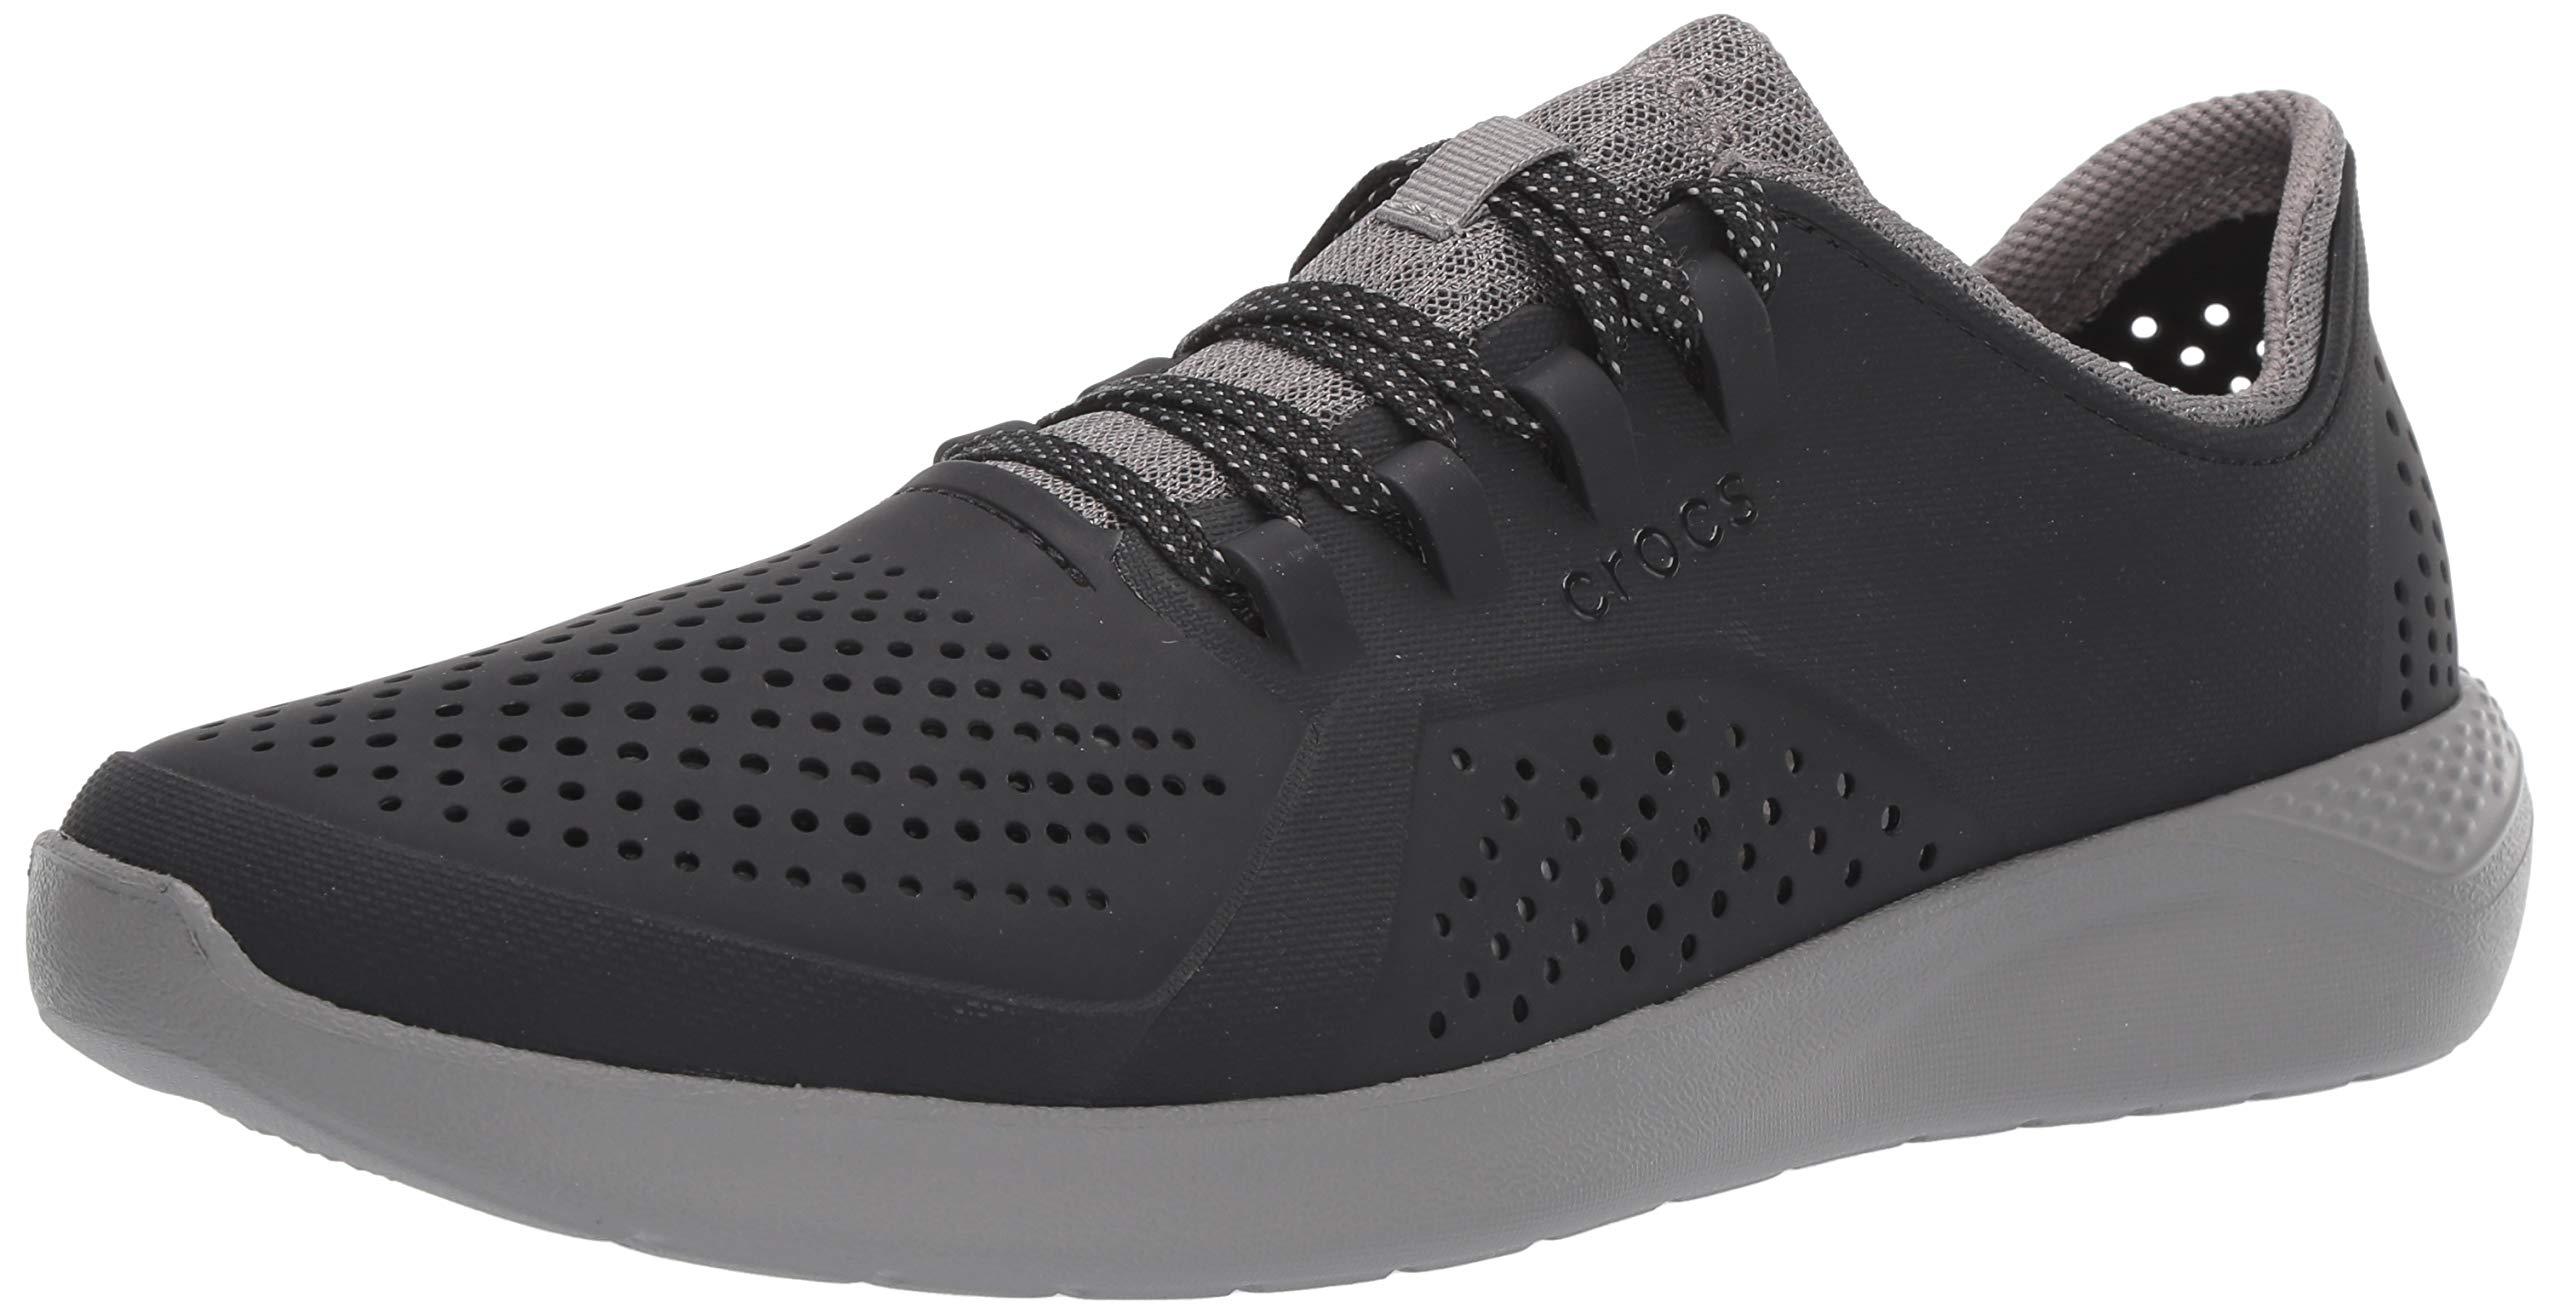 Crocs Men's LiteRide Pacer Sneaker, Black/Smoke, 11 M US by Crocs